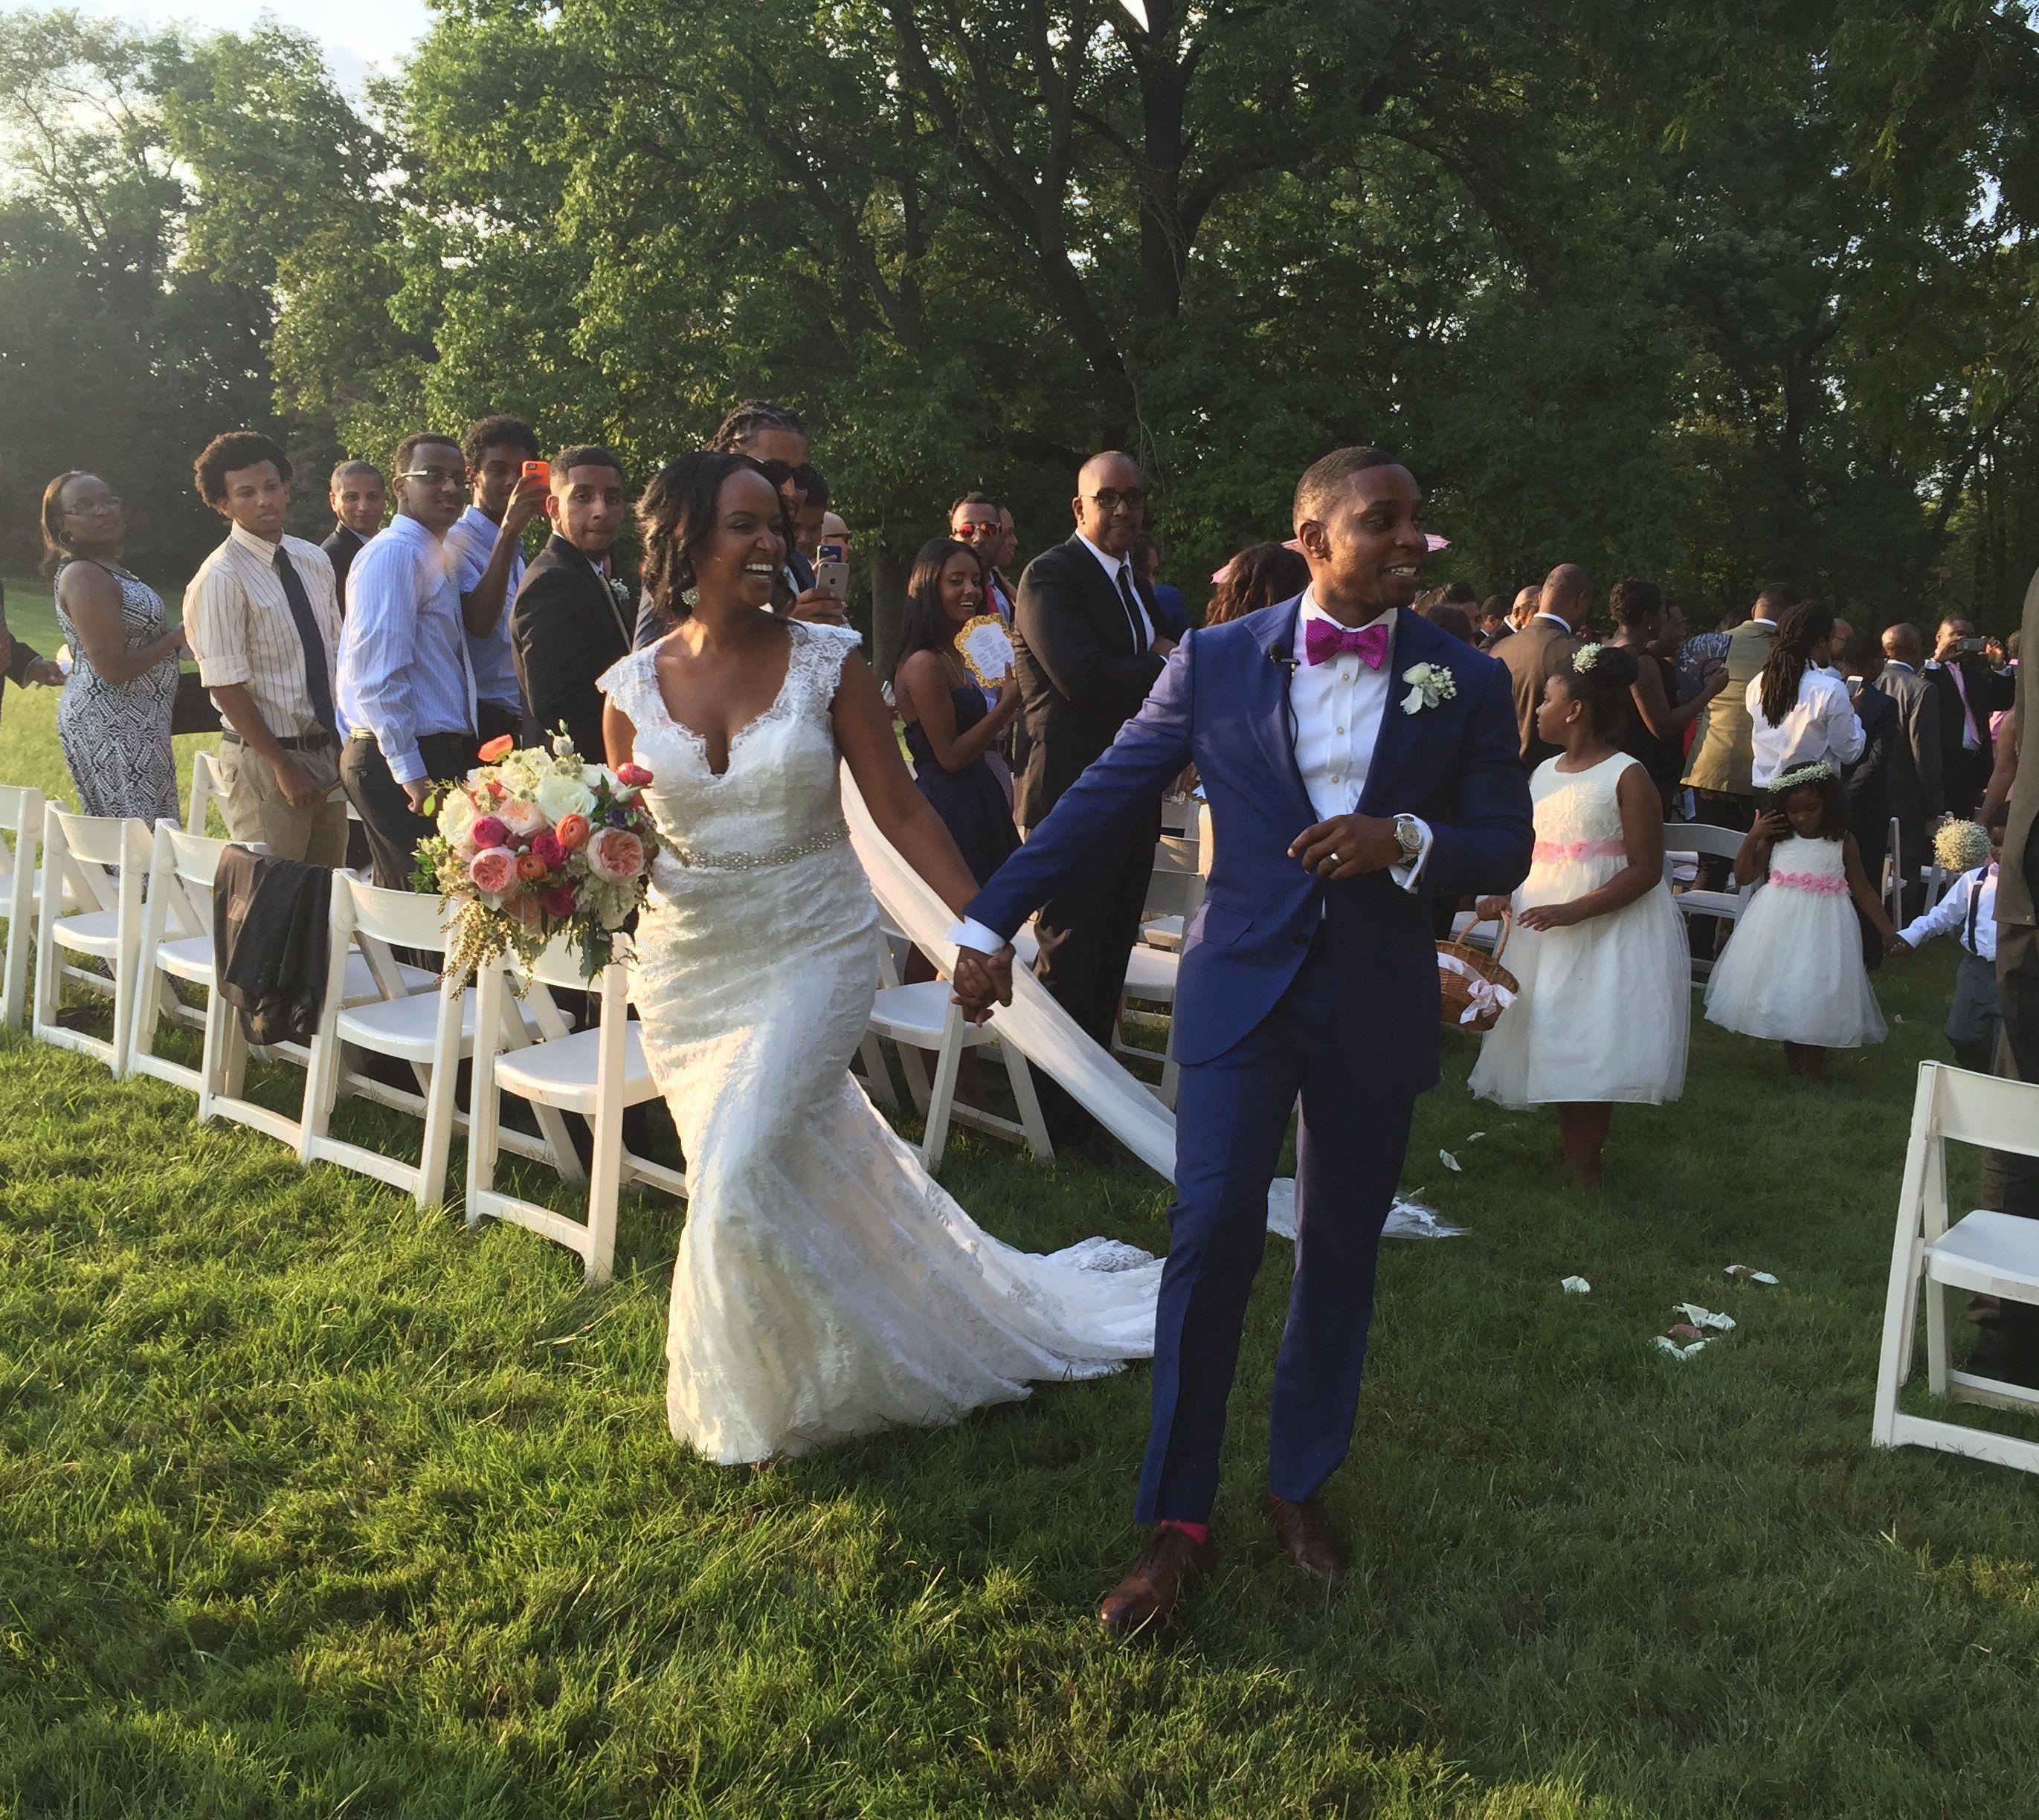 Maaden Louis Wedding Stone Manor Wedding Photography